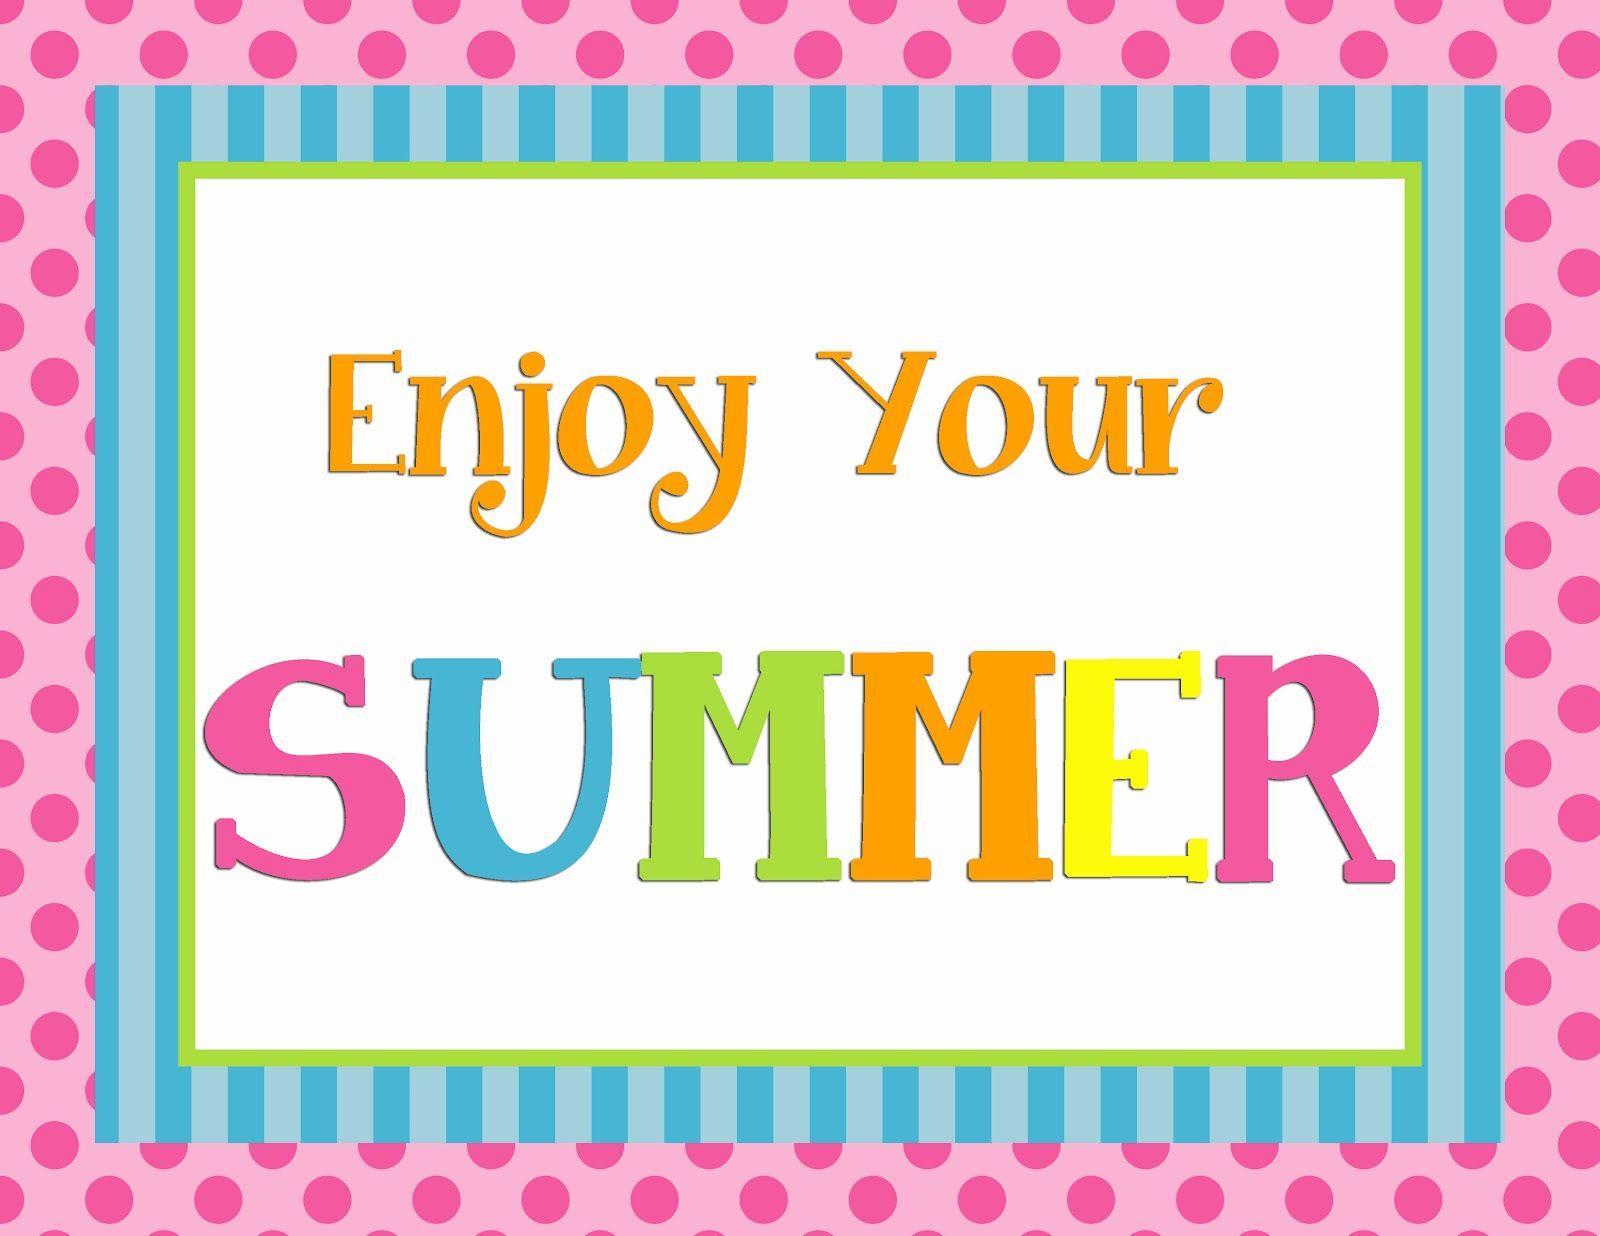 graphic regarding Summer Printable named Totally free Printable summer season indicator Free of charge Printables Summer time indicators